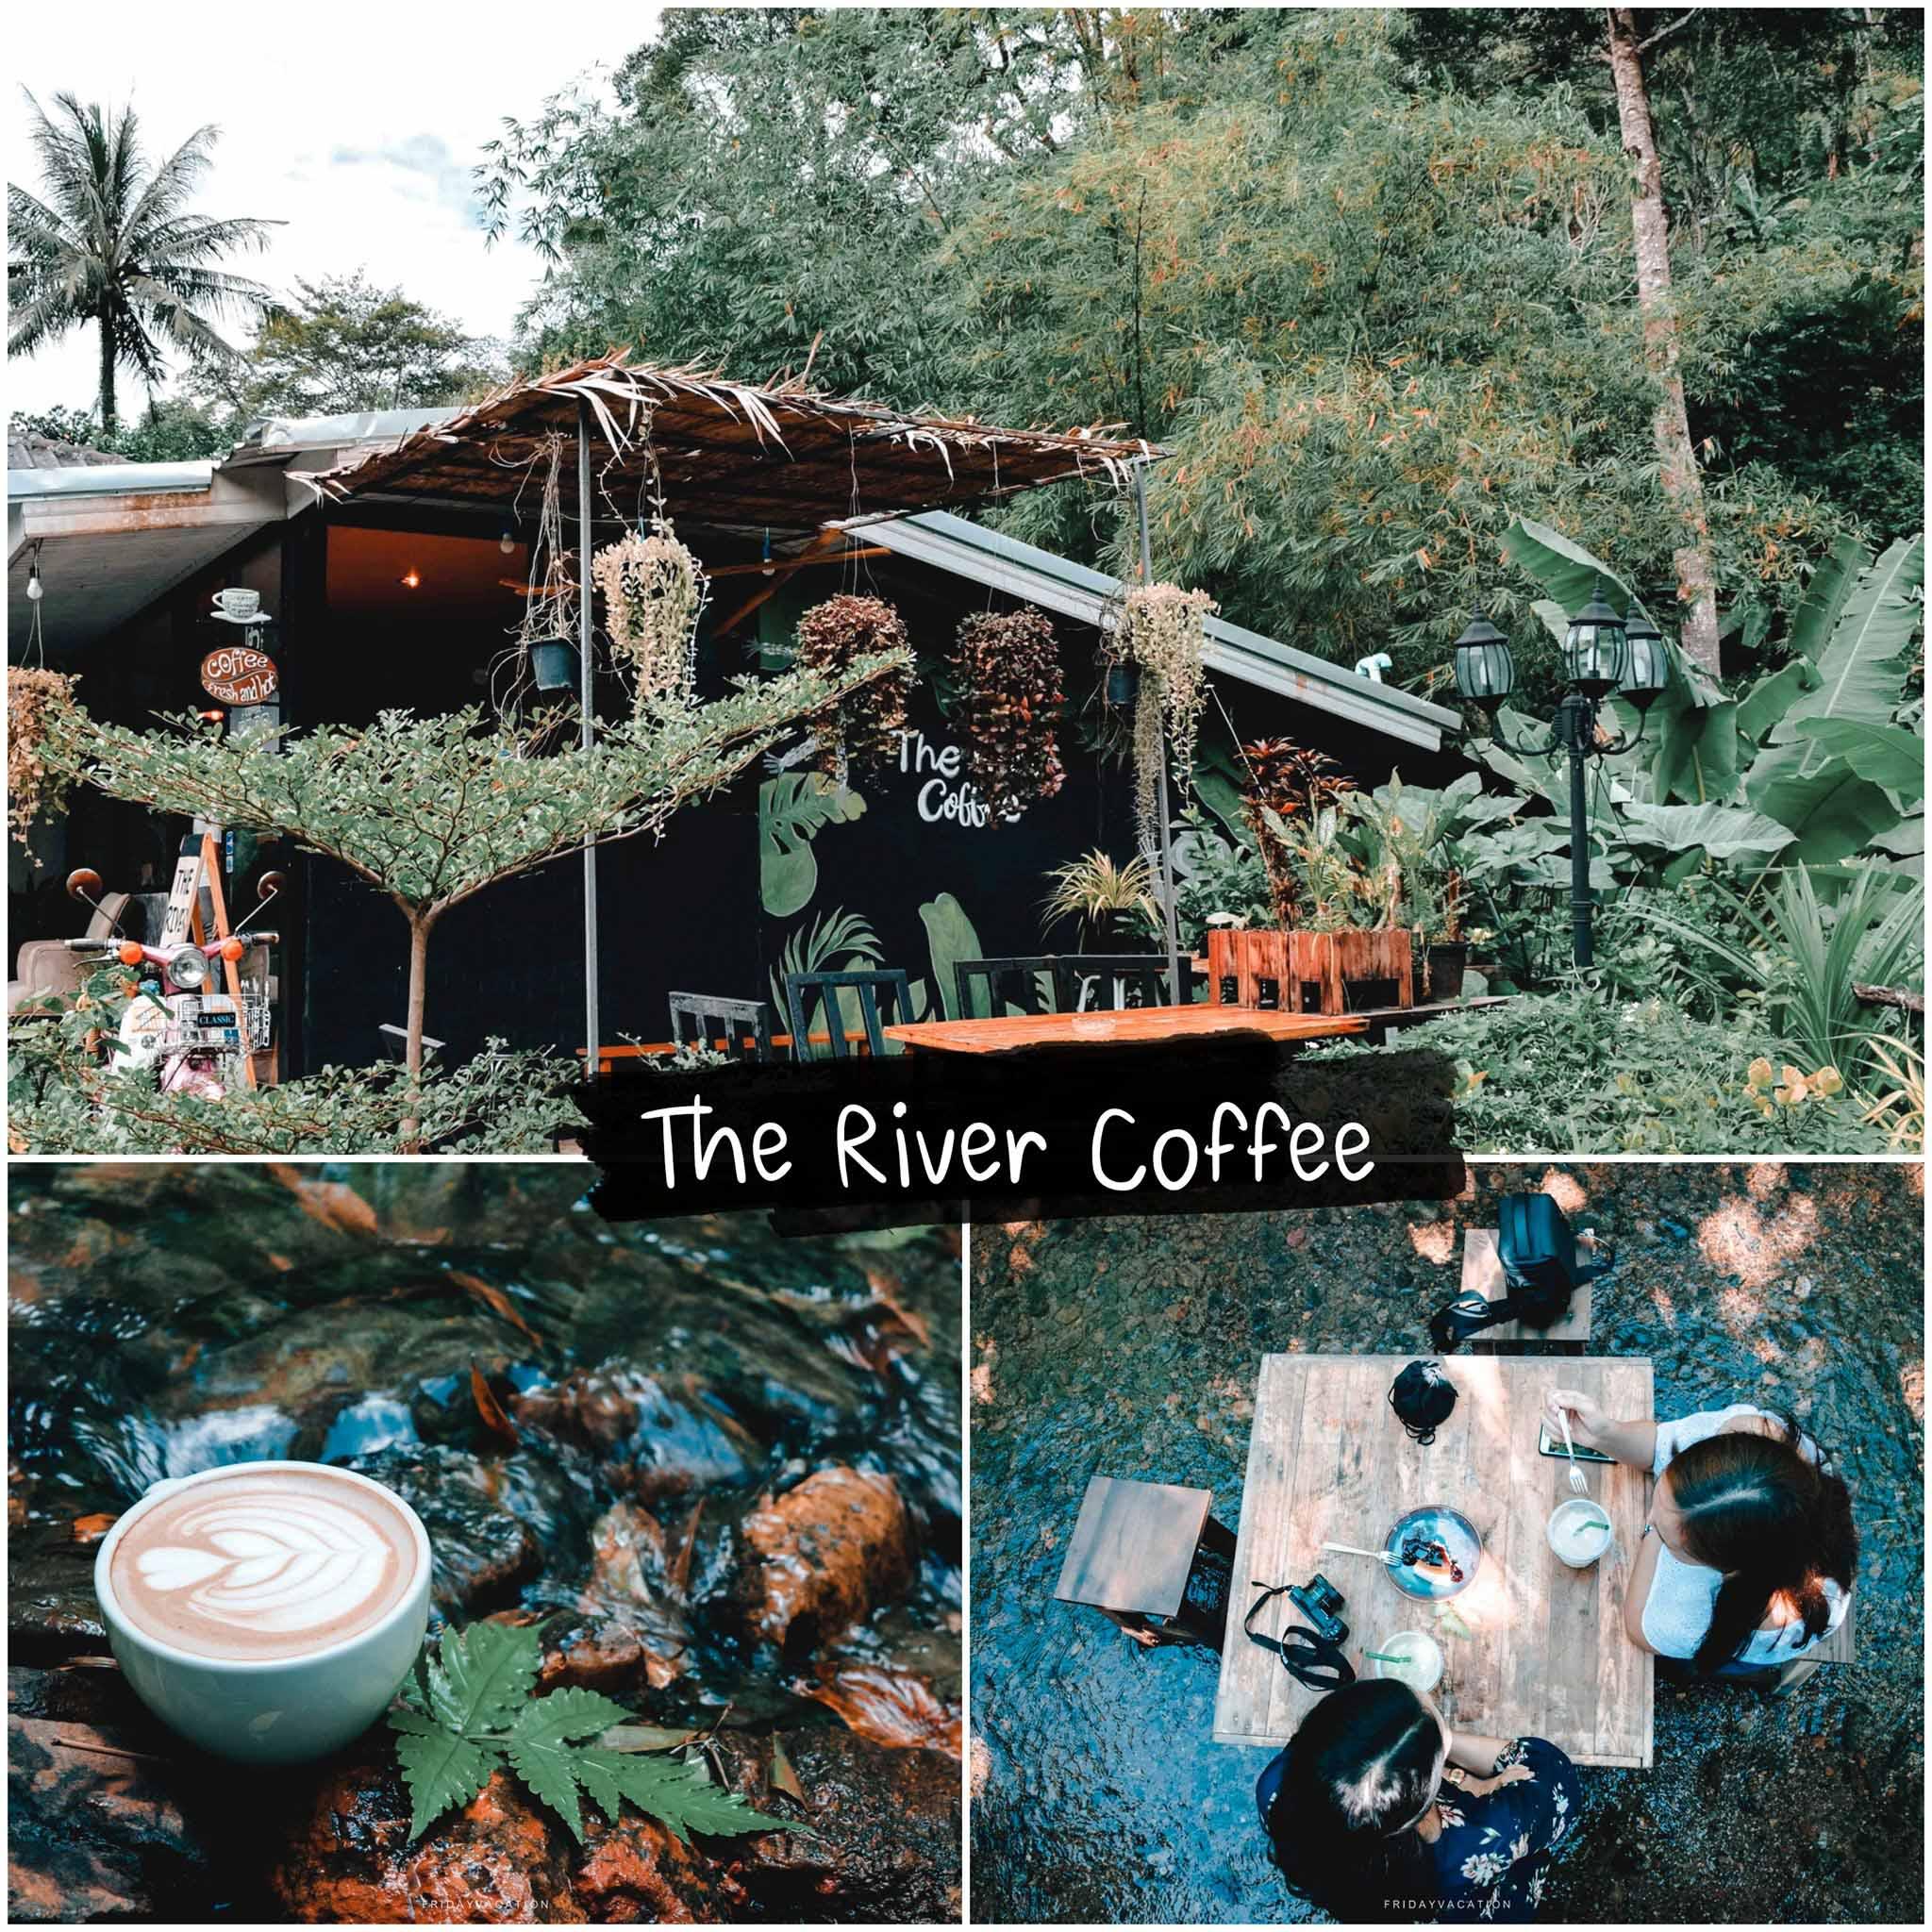 The-river-Coffee คาเฟ่ภูเก็ตริมลำธารสวยๆ-ฟินๆ-เค้กเครื่องดื่มอร่อย-นั่งแช่เท้ากันฟินๆเลยย ภูเก็ต,คาเฟ่,ที่เที่ยว,ร้านกาแฟ,เด็ด,อร่อย,ต้องลอง